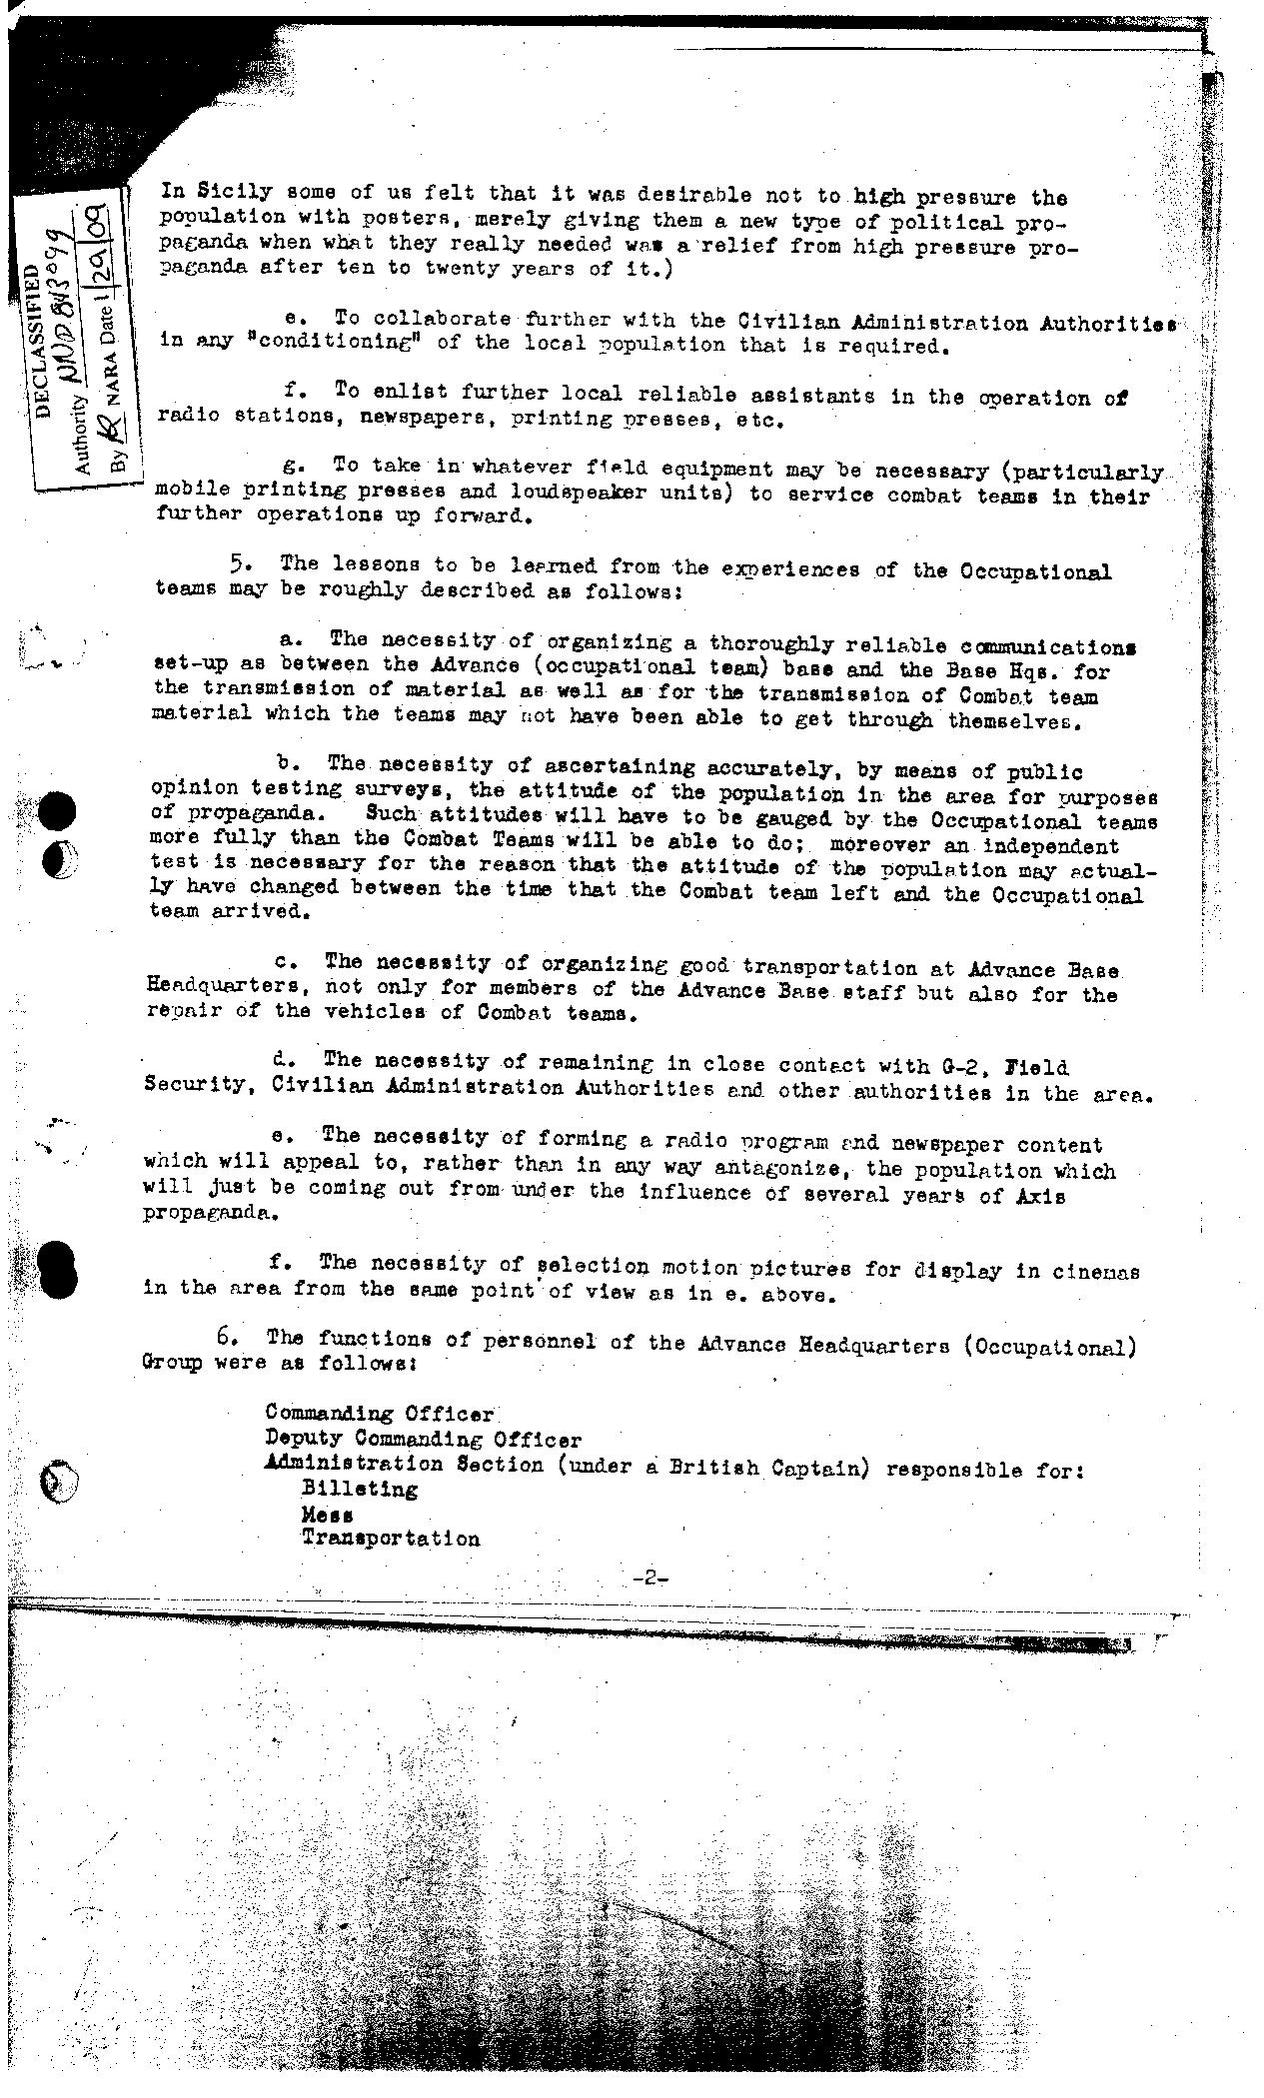 filepsychological warfare branch memopdf wikipedia